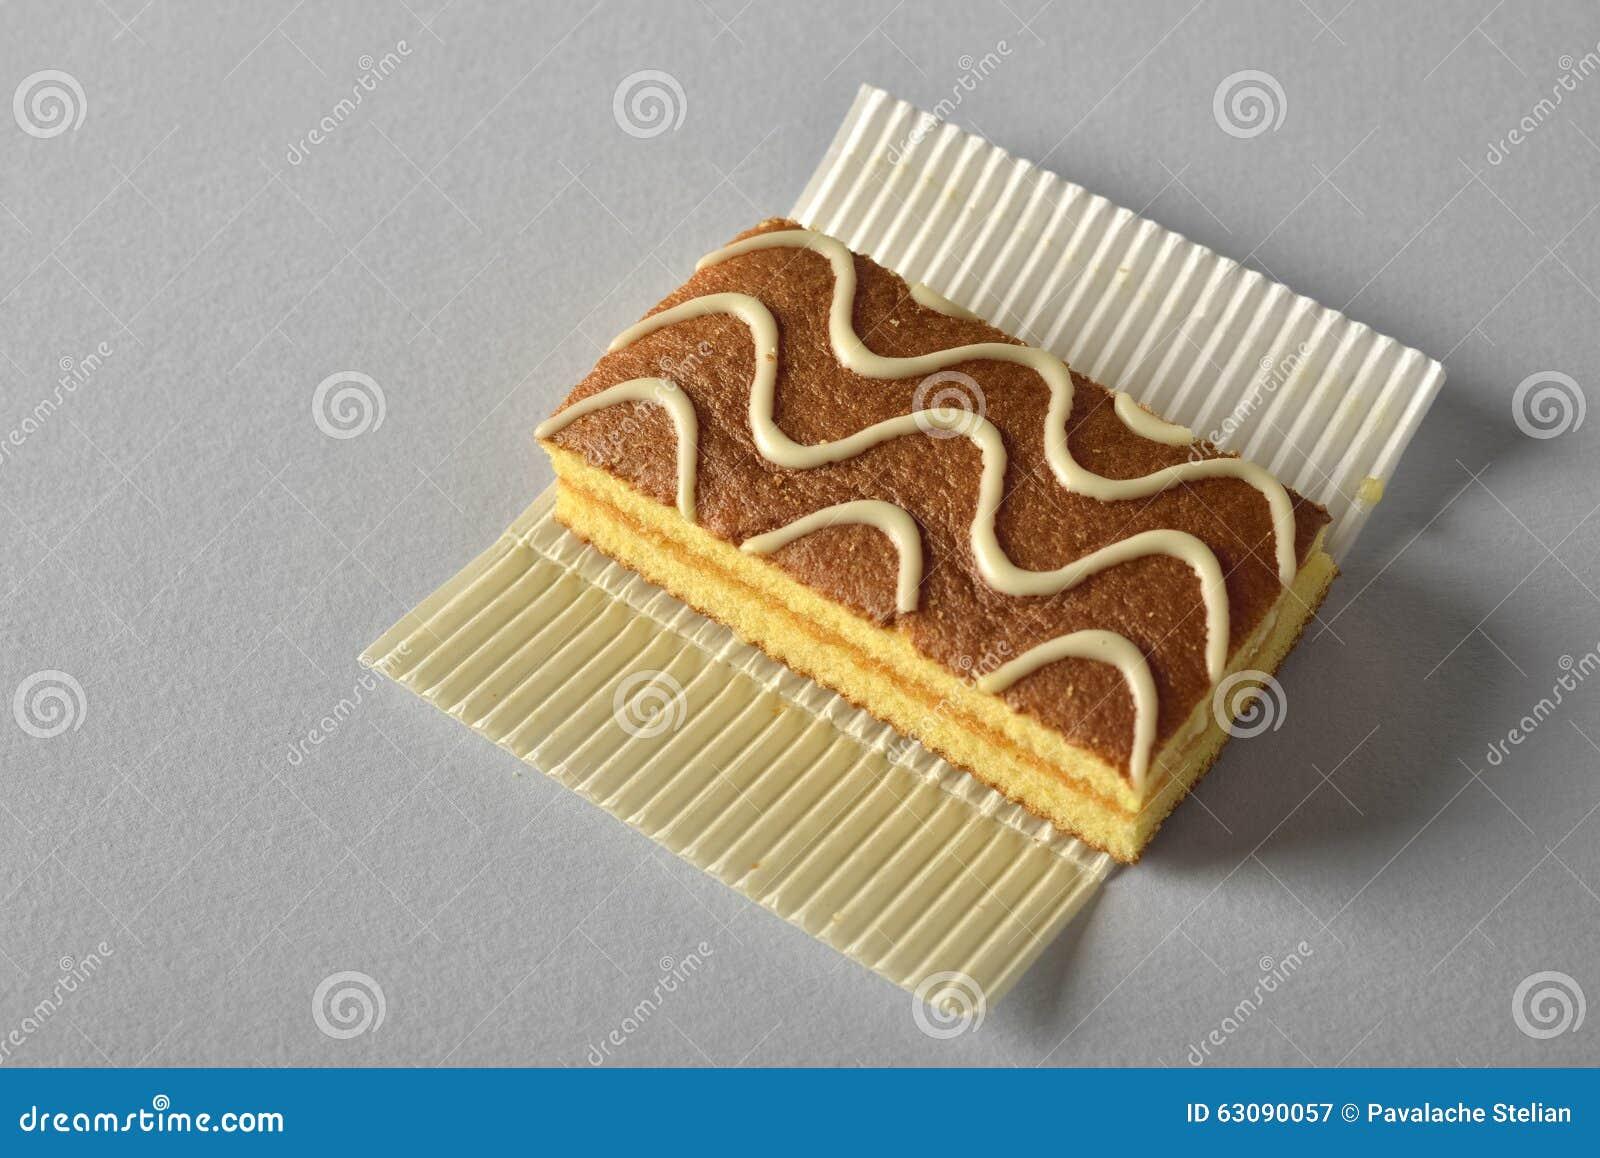 Download Gâteau de Mini Cream image stock. Image du crème, breakfast - 63090057